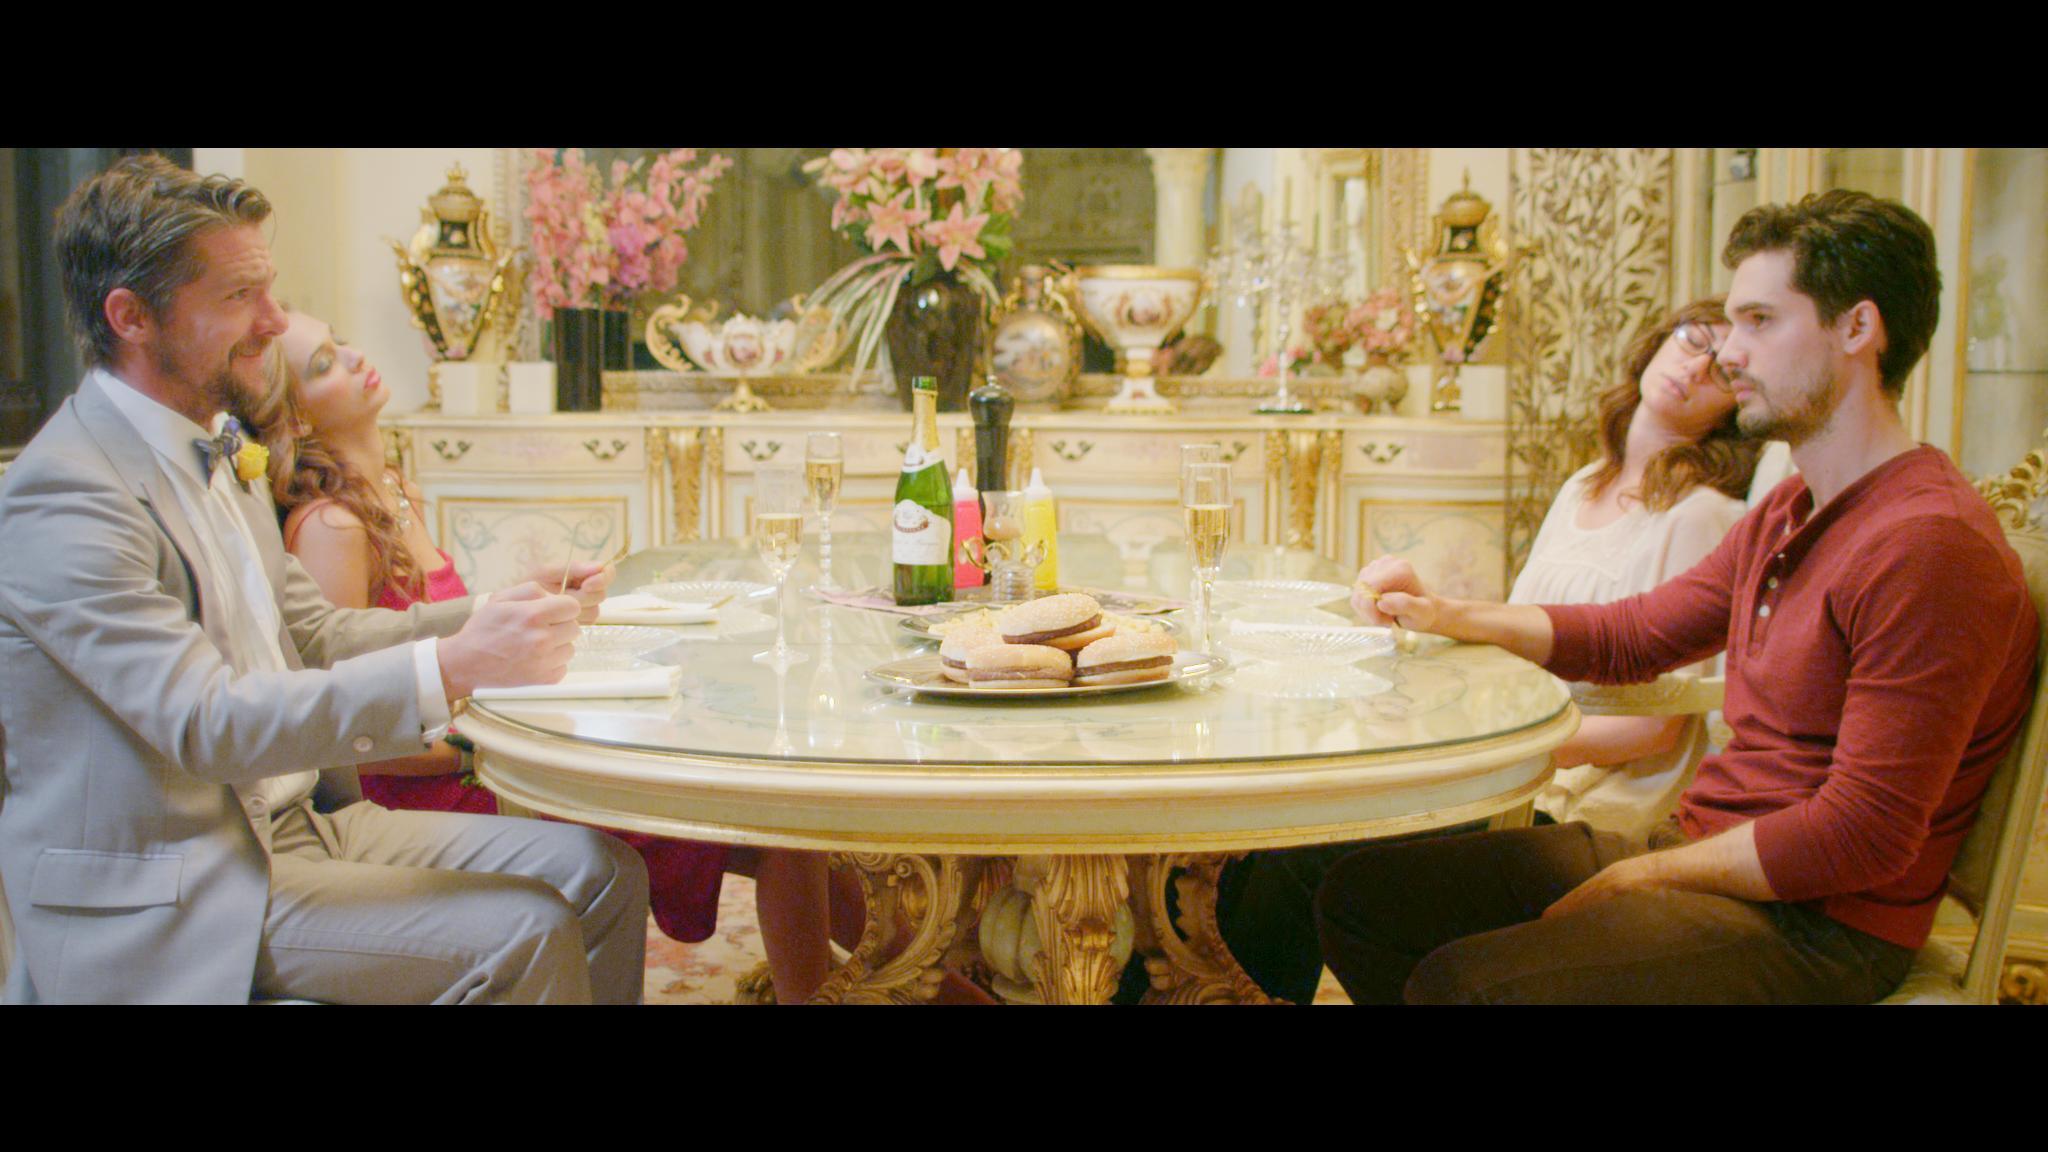 Zachary Knighton, Steven Strait, Kate Siegel, and Jessica Dykstra in Hot (2016)